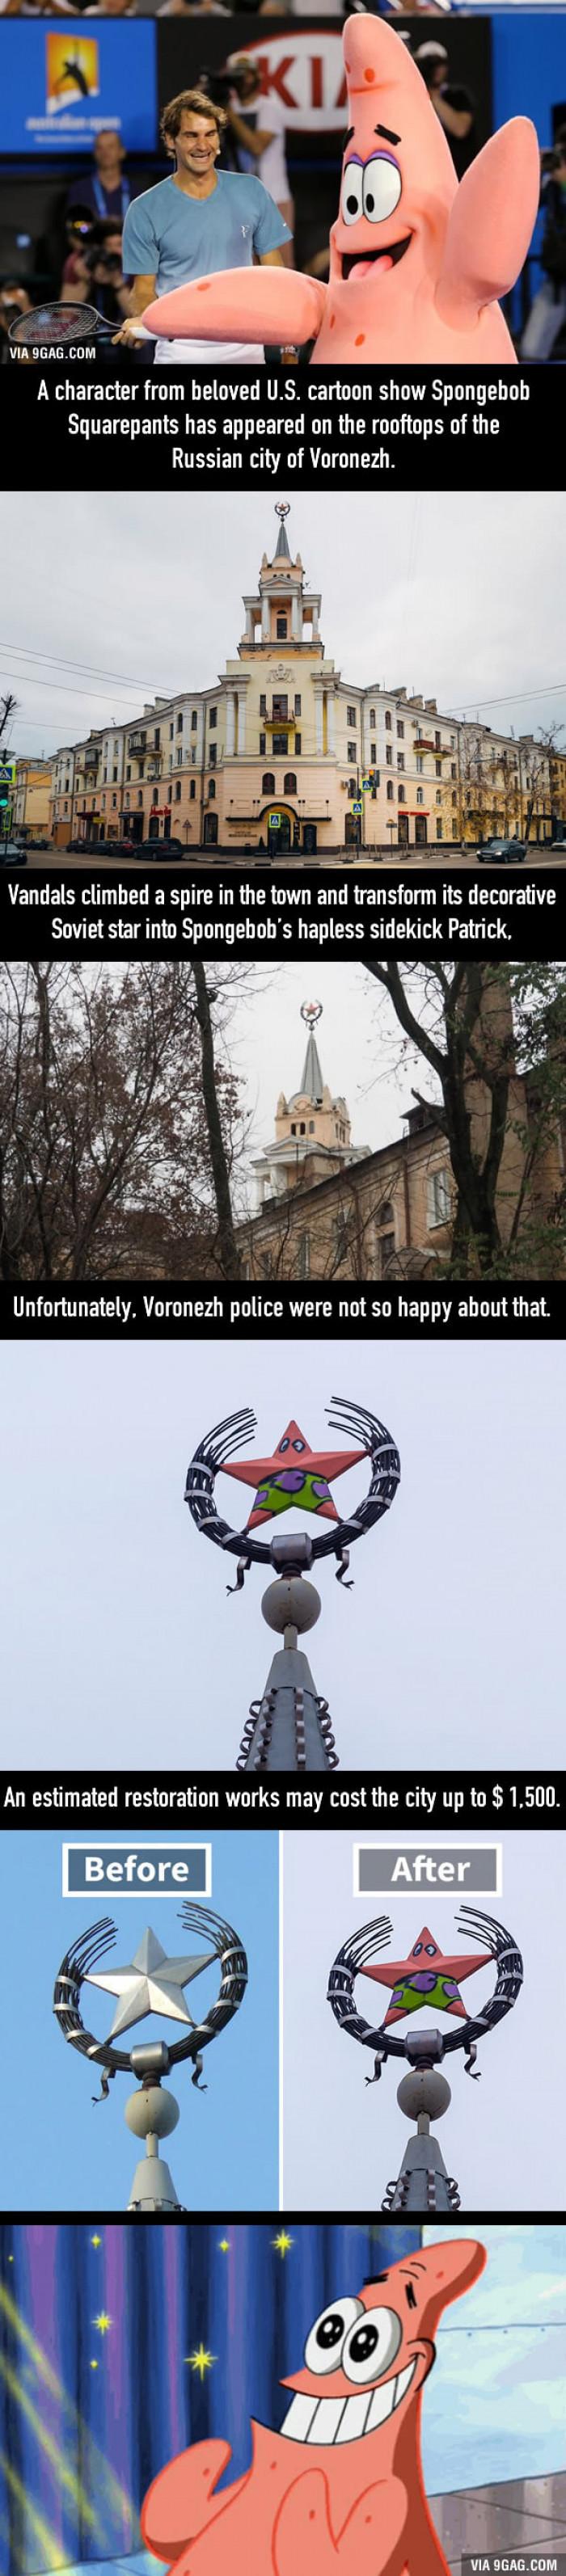 Russian Vandals Turn Soviet Star into Spongebob's Patrick